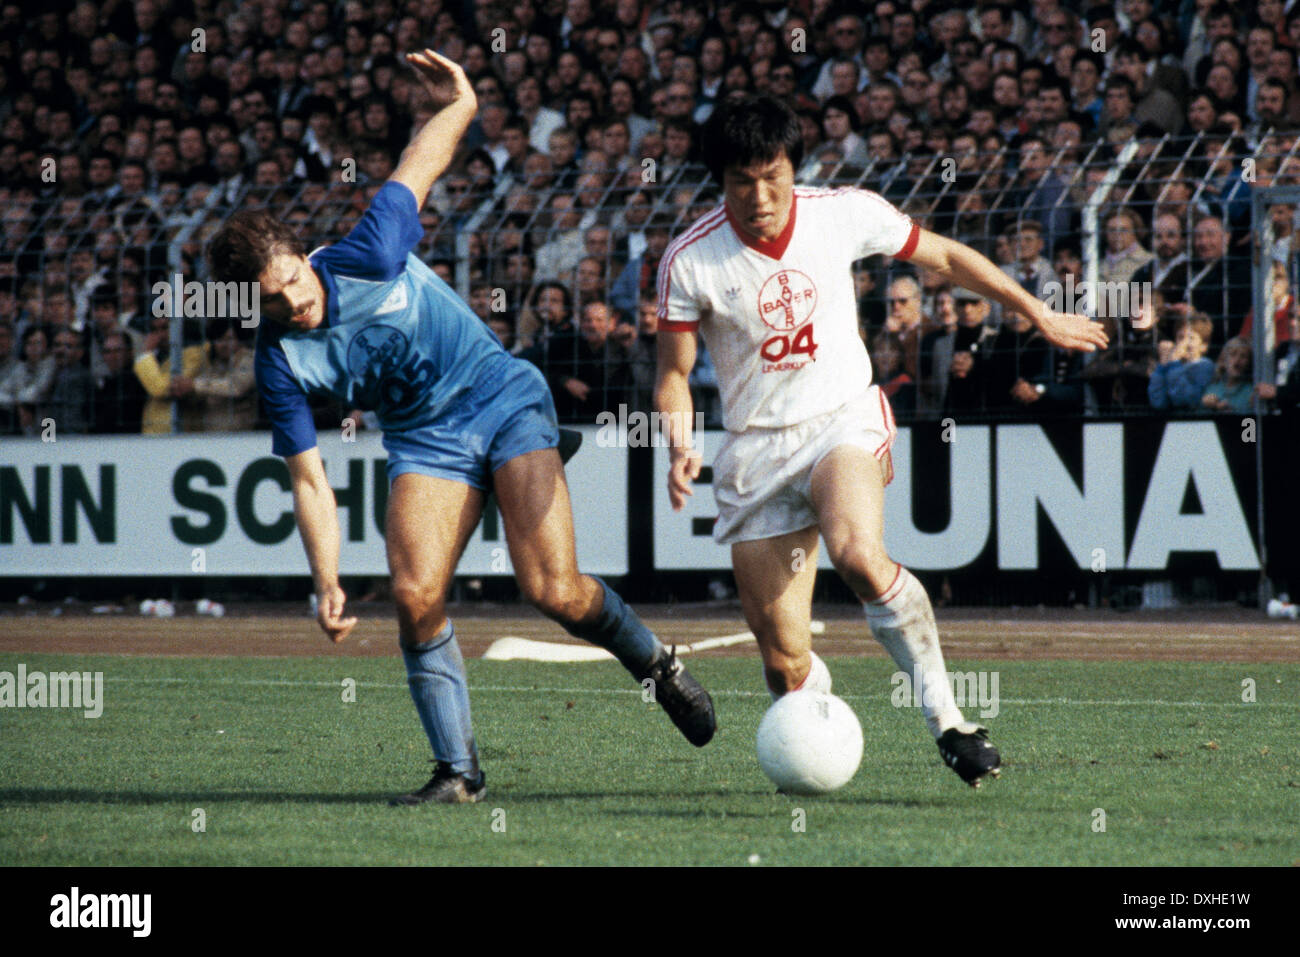 football, Bundesliga, 1983/1984, Grotenburg Stadium, FC Bayer 05 Uerdingen versus Bayer 04 Leverkusen 2:1, scene of the match, Helmut Gulich (Uerdingen) left and Bum-Kun Cha (Leverkusen) - Stock Image